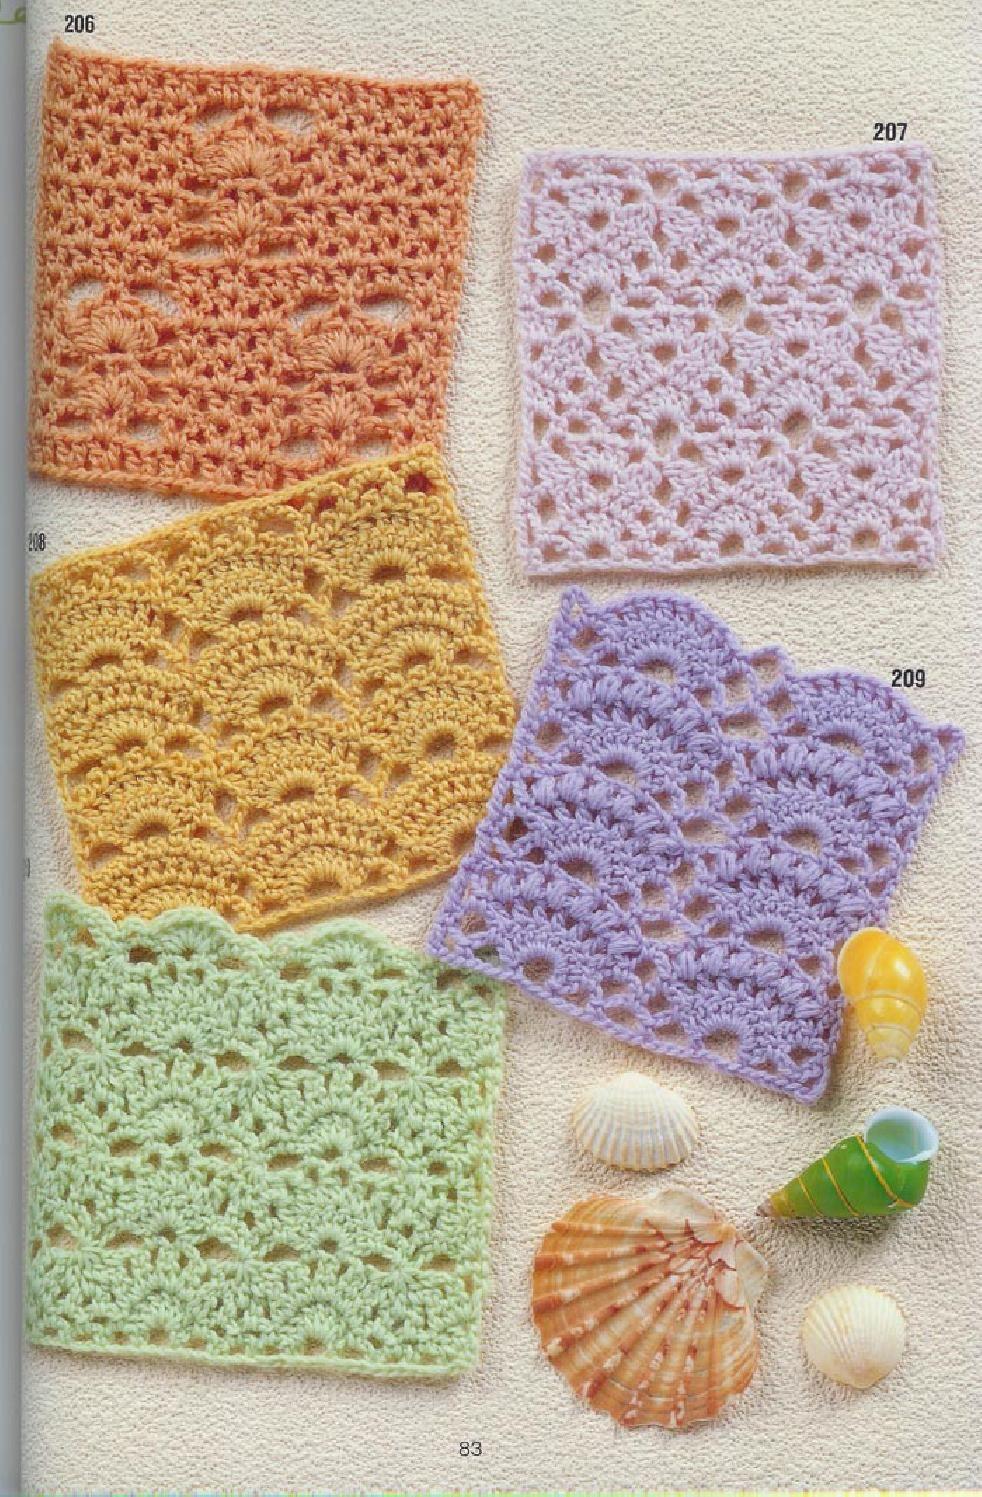 262 patrones crochet   crochet stiches   Pinterest   Patrones ...